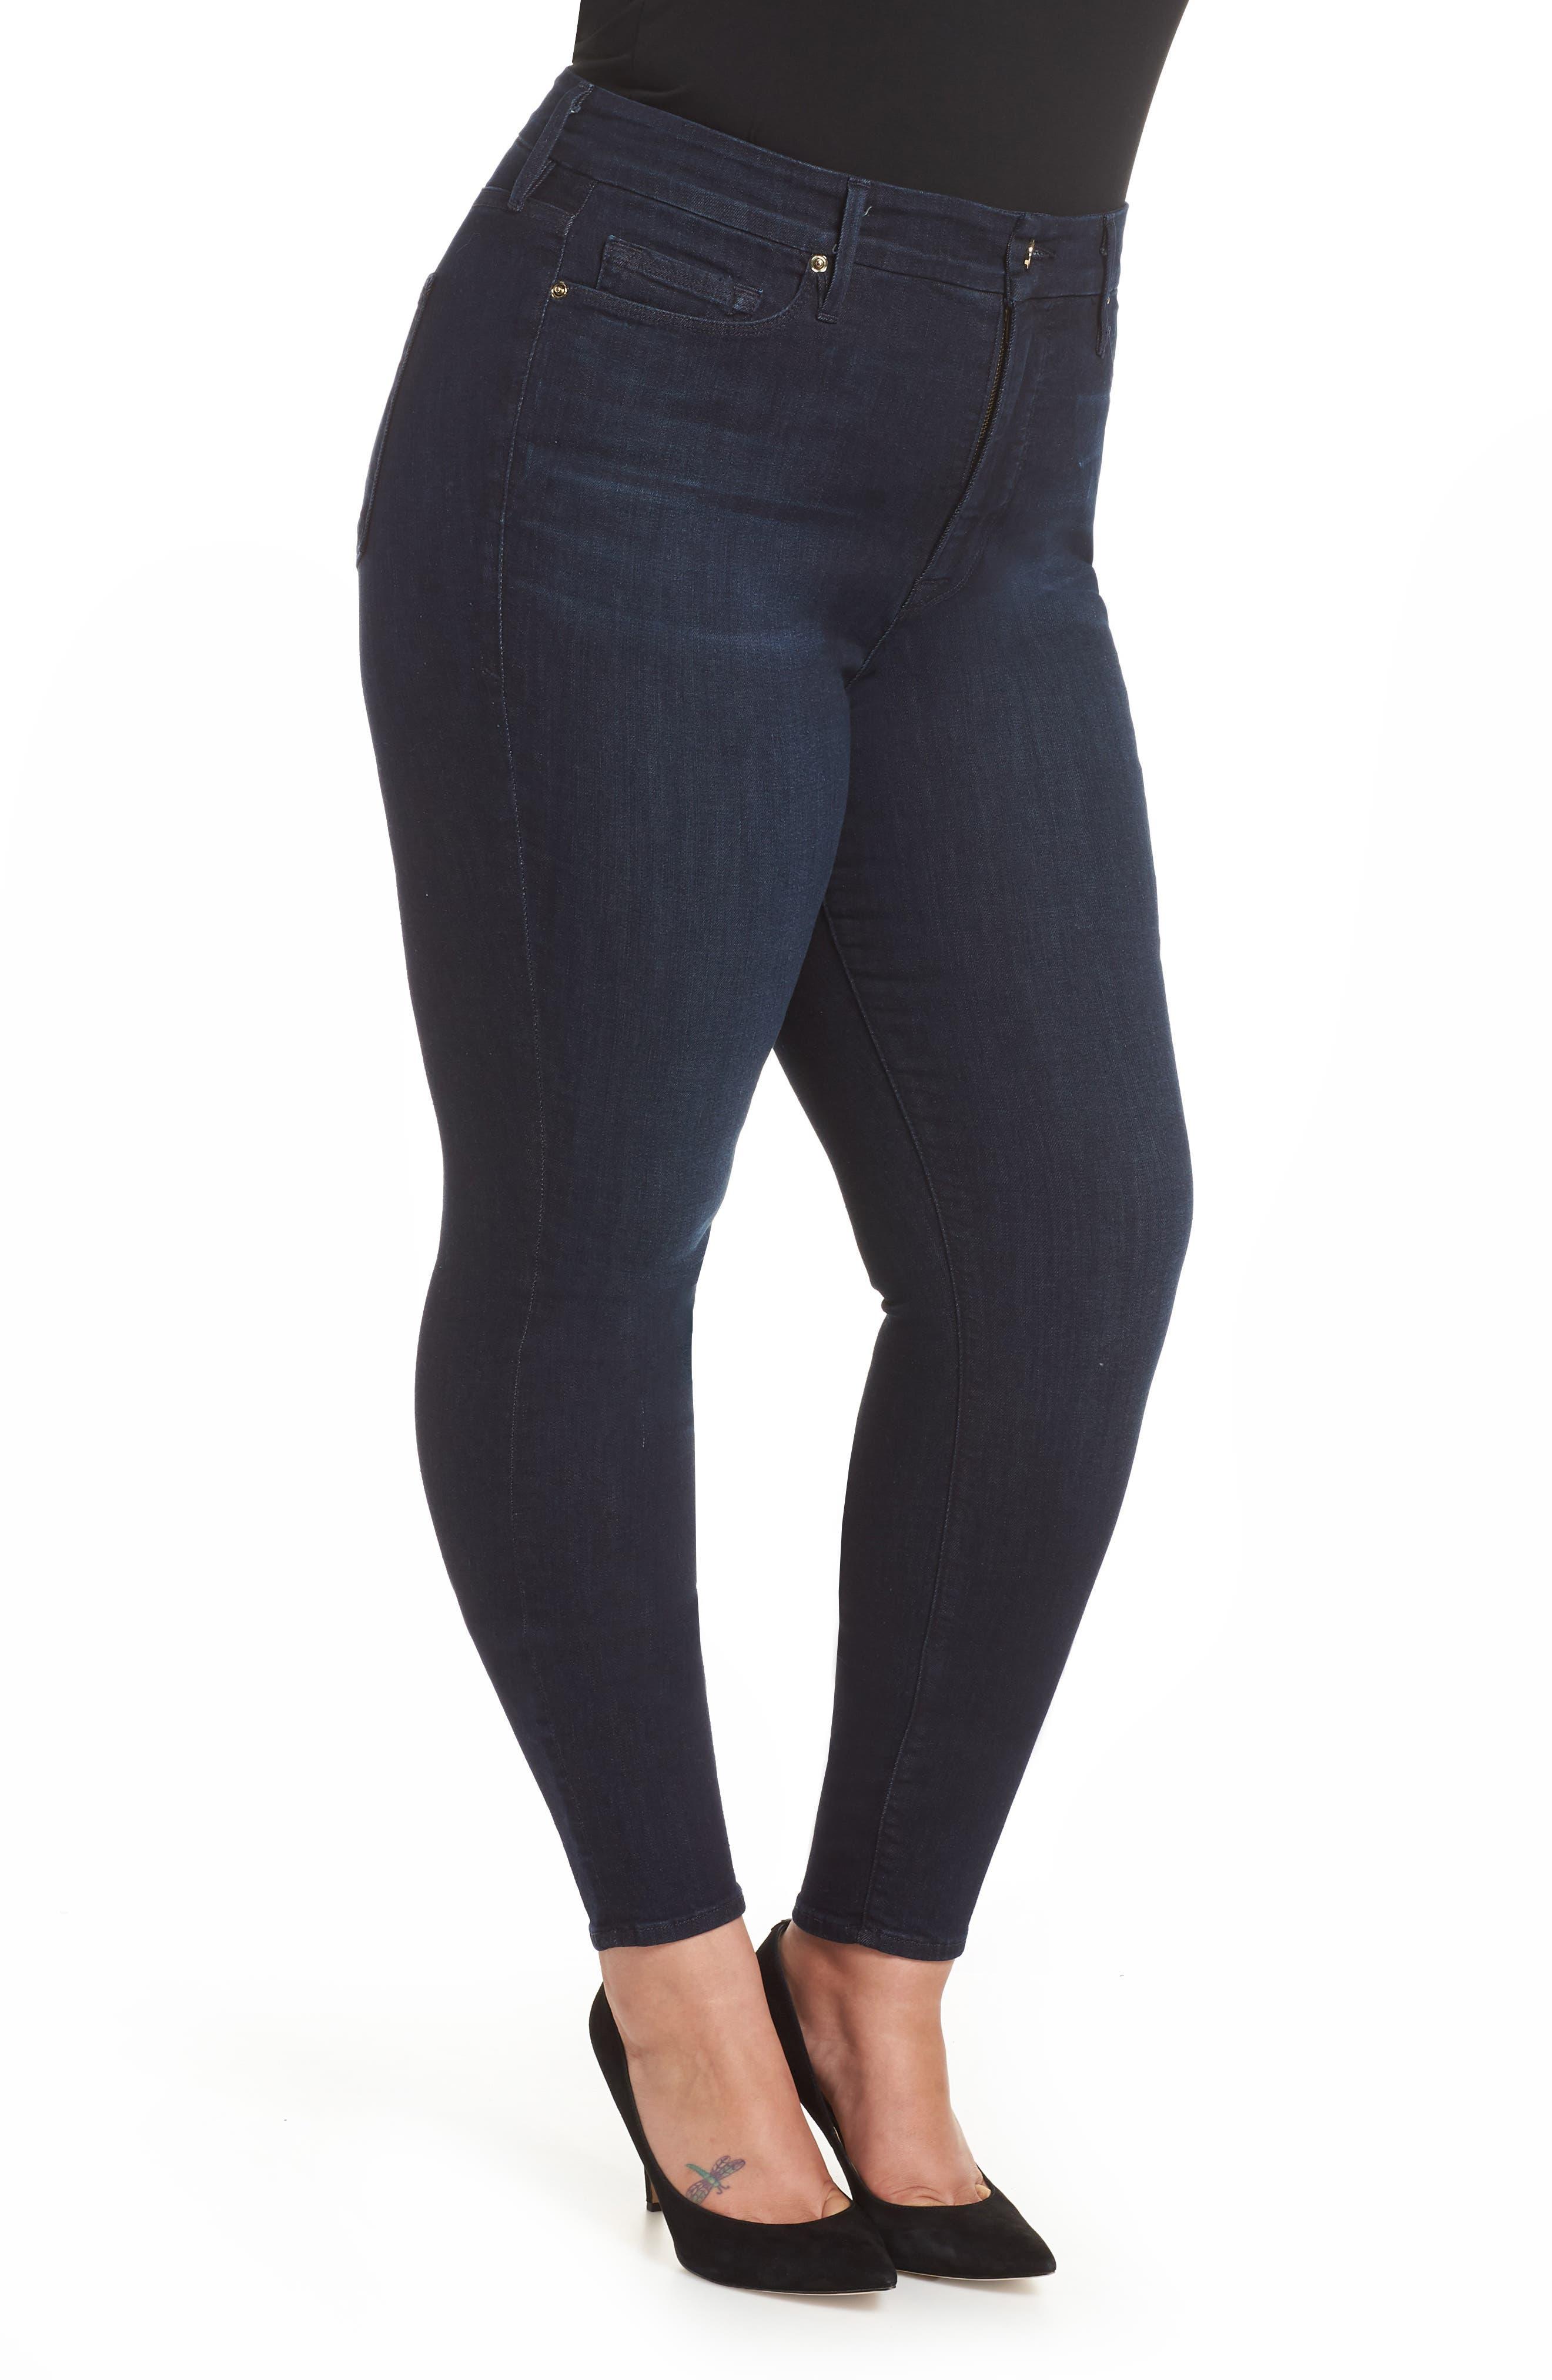 GOOD AMERICAN,                             Good Legs High Waist Skinny Jeans,                             Alternate thumbnail 10, color,                             BLUE224